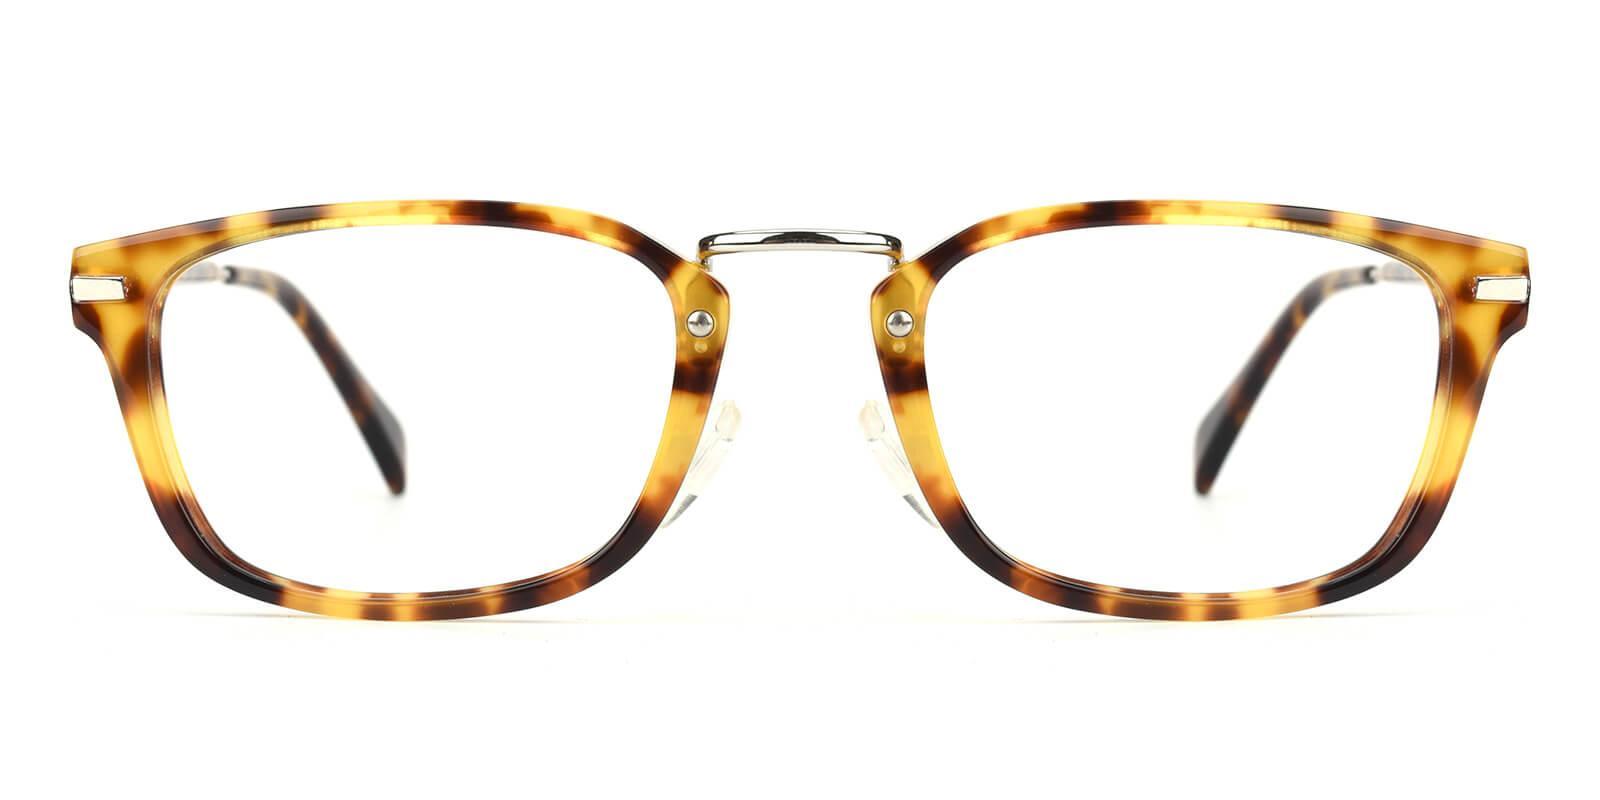 Madatte-Tortoise-Rectangle-Acetate / Metal-Eyeglasses-additional2